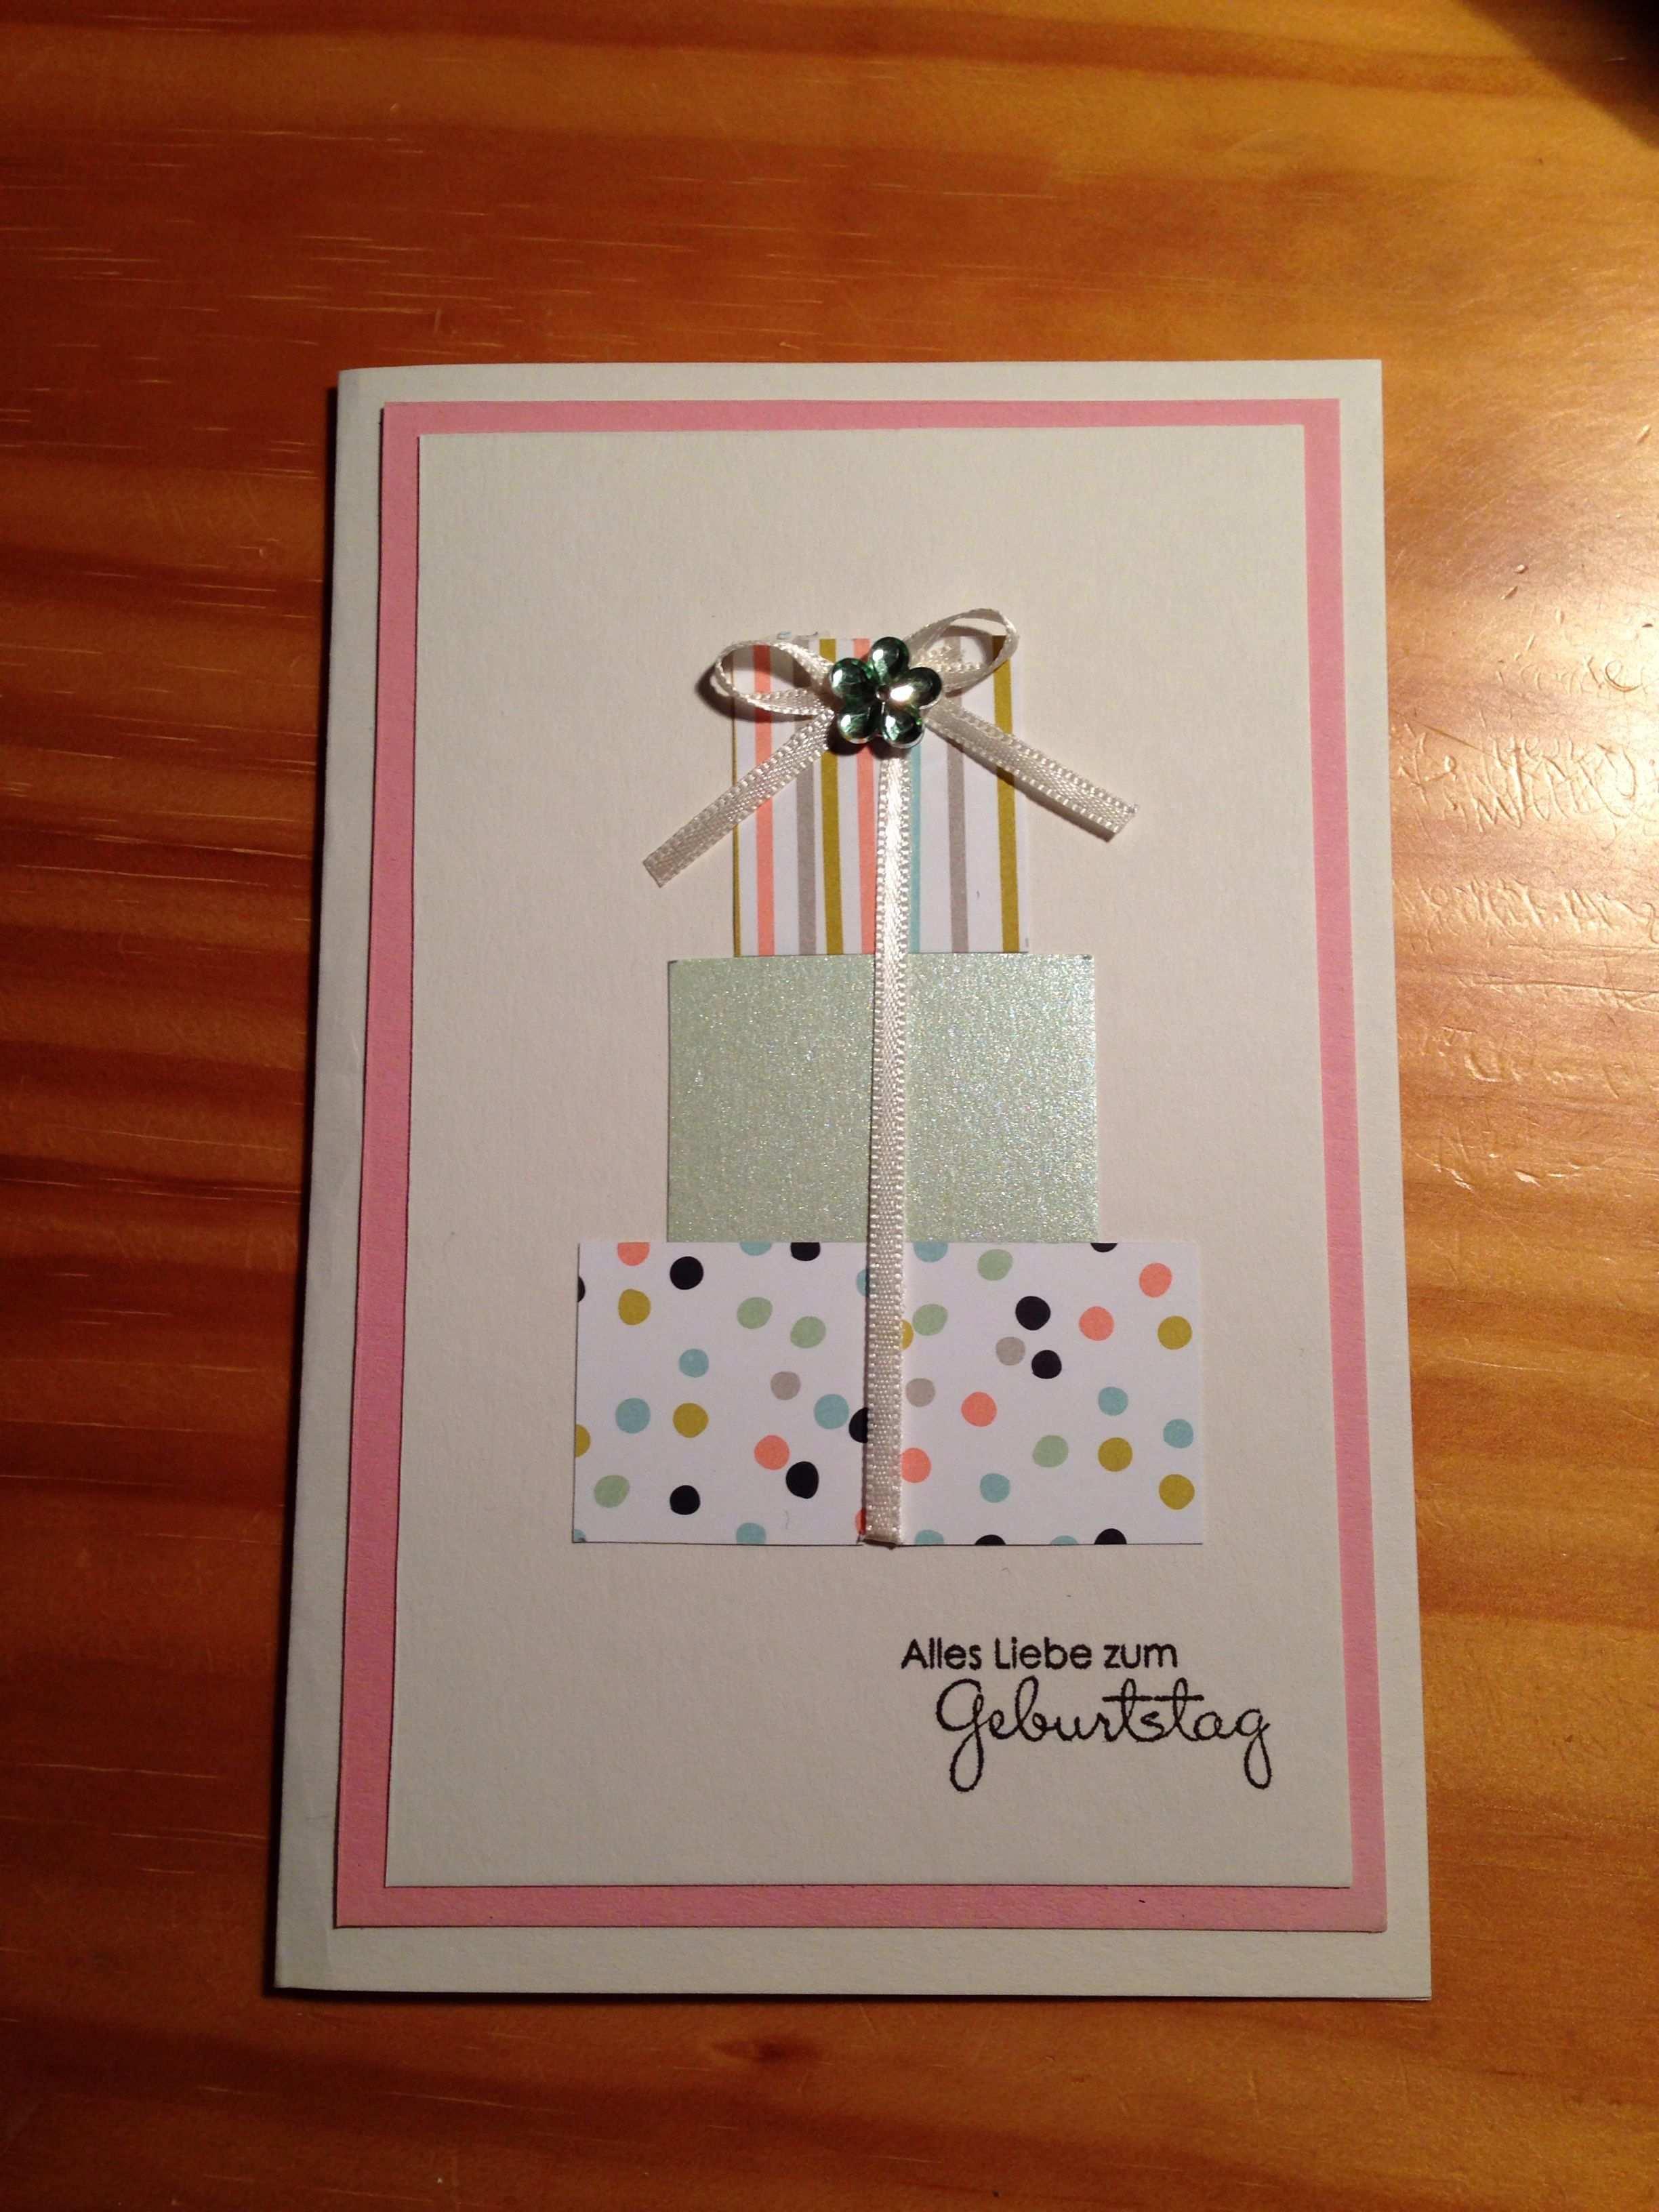 Geburtstagskarte Karten Basteln Geburtstagskarte Karten